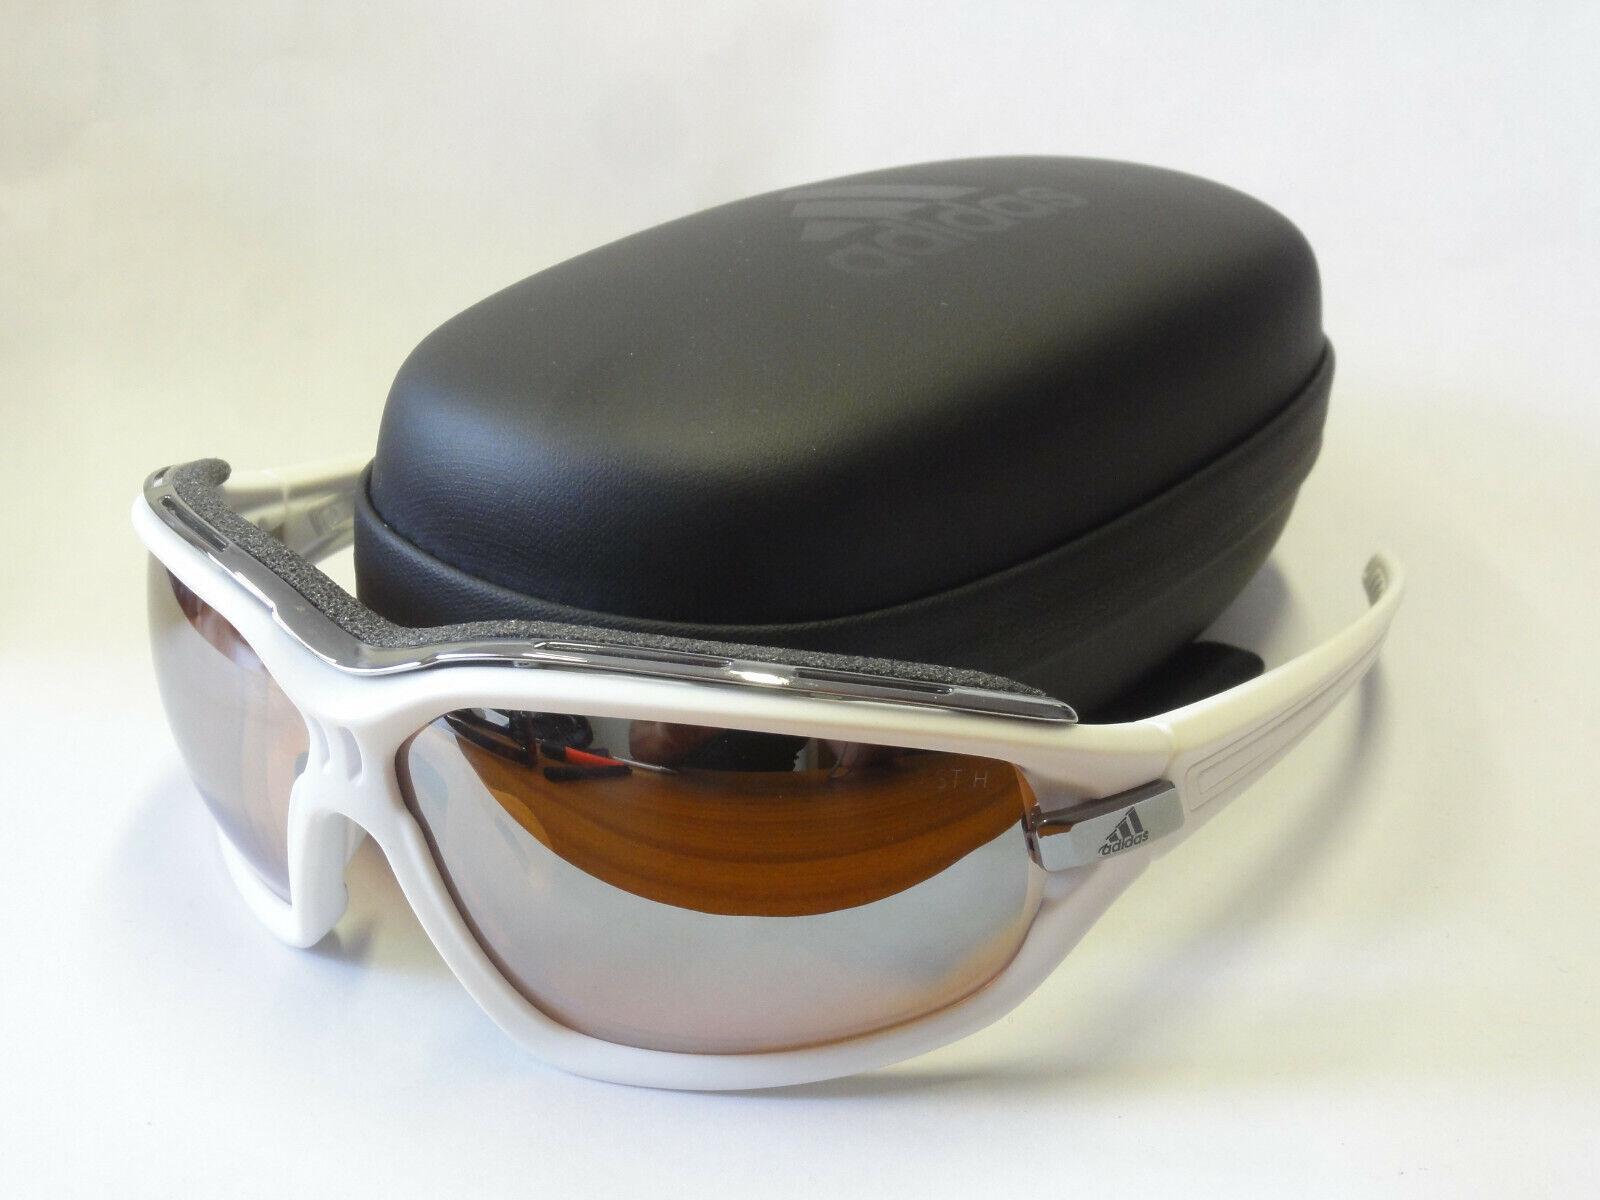 Adidas Sport Glasses EVIL EYE Pro S a194 6061 Matt Weiß New mit Pouch